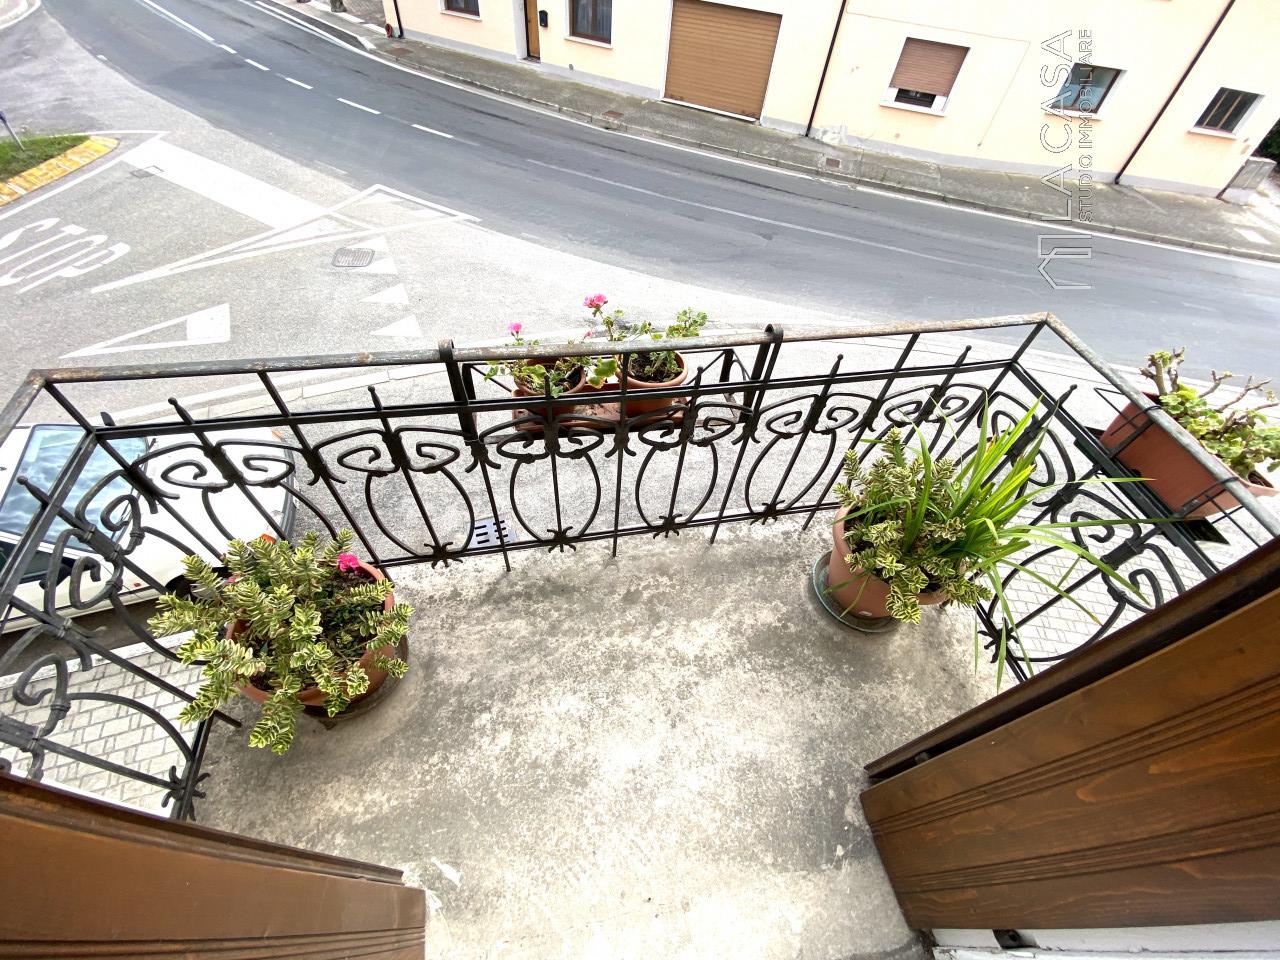 Palazzo plurifamiliare in vendita a Valvasone Arzene - Rif. P3 https://images.gestionaleimmobiliare.it/foto/annunci/200827/2284141/1280x1280/016__img_3723_wmk_0.jpg